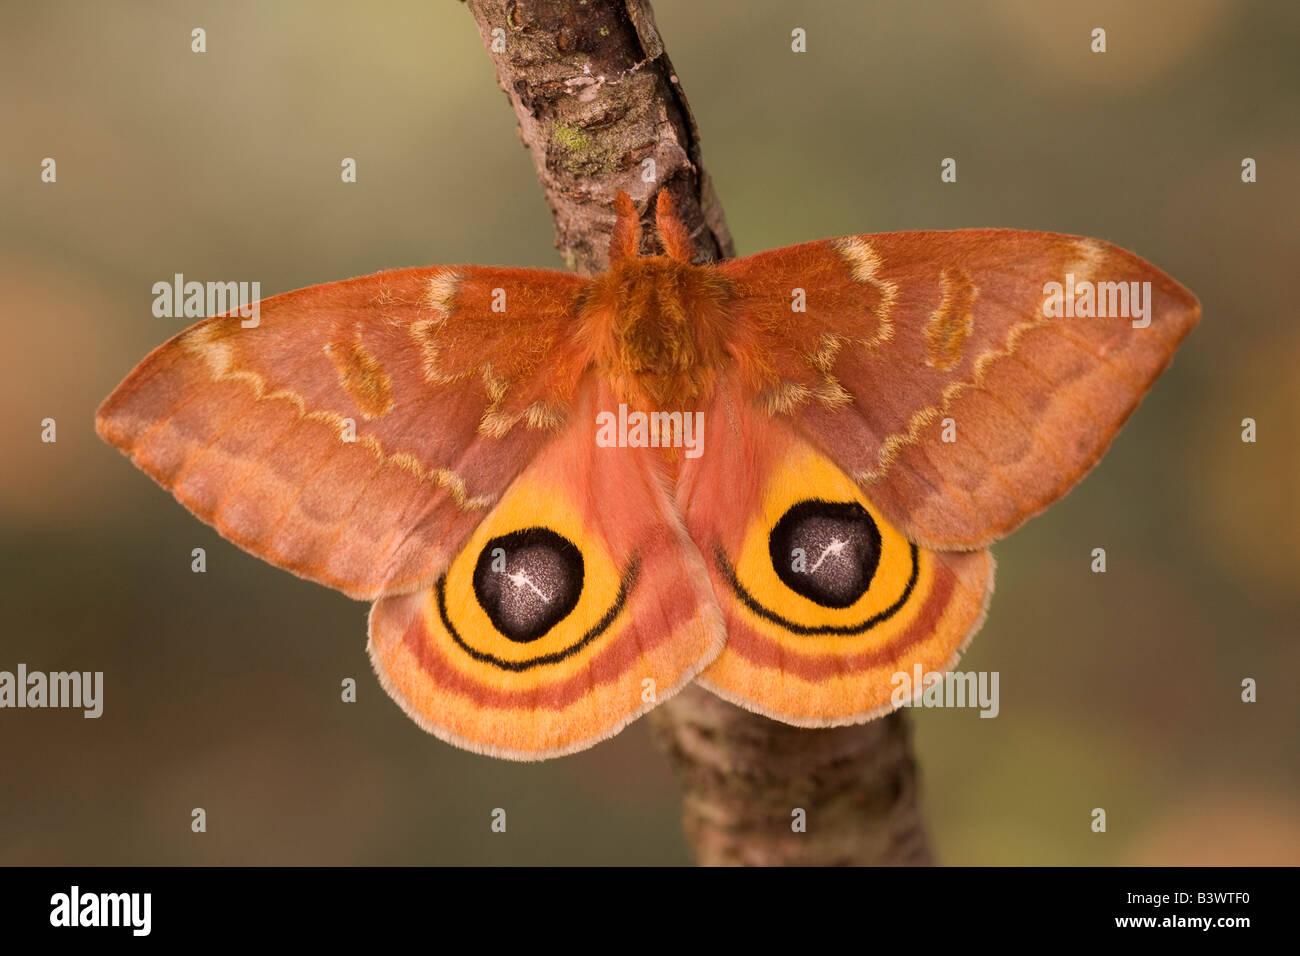 Io moth (Automeris io) on a branch - Stock Image